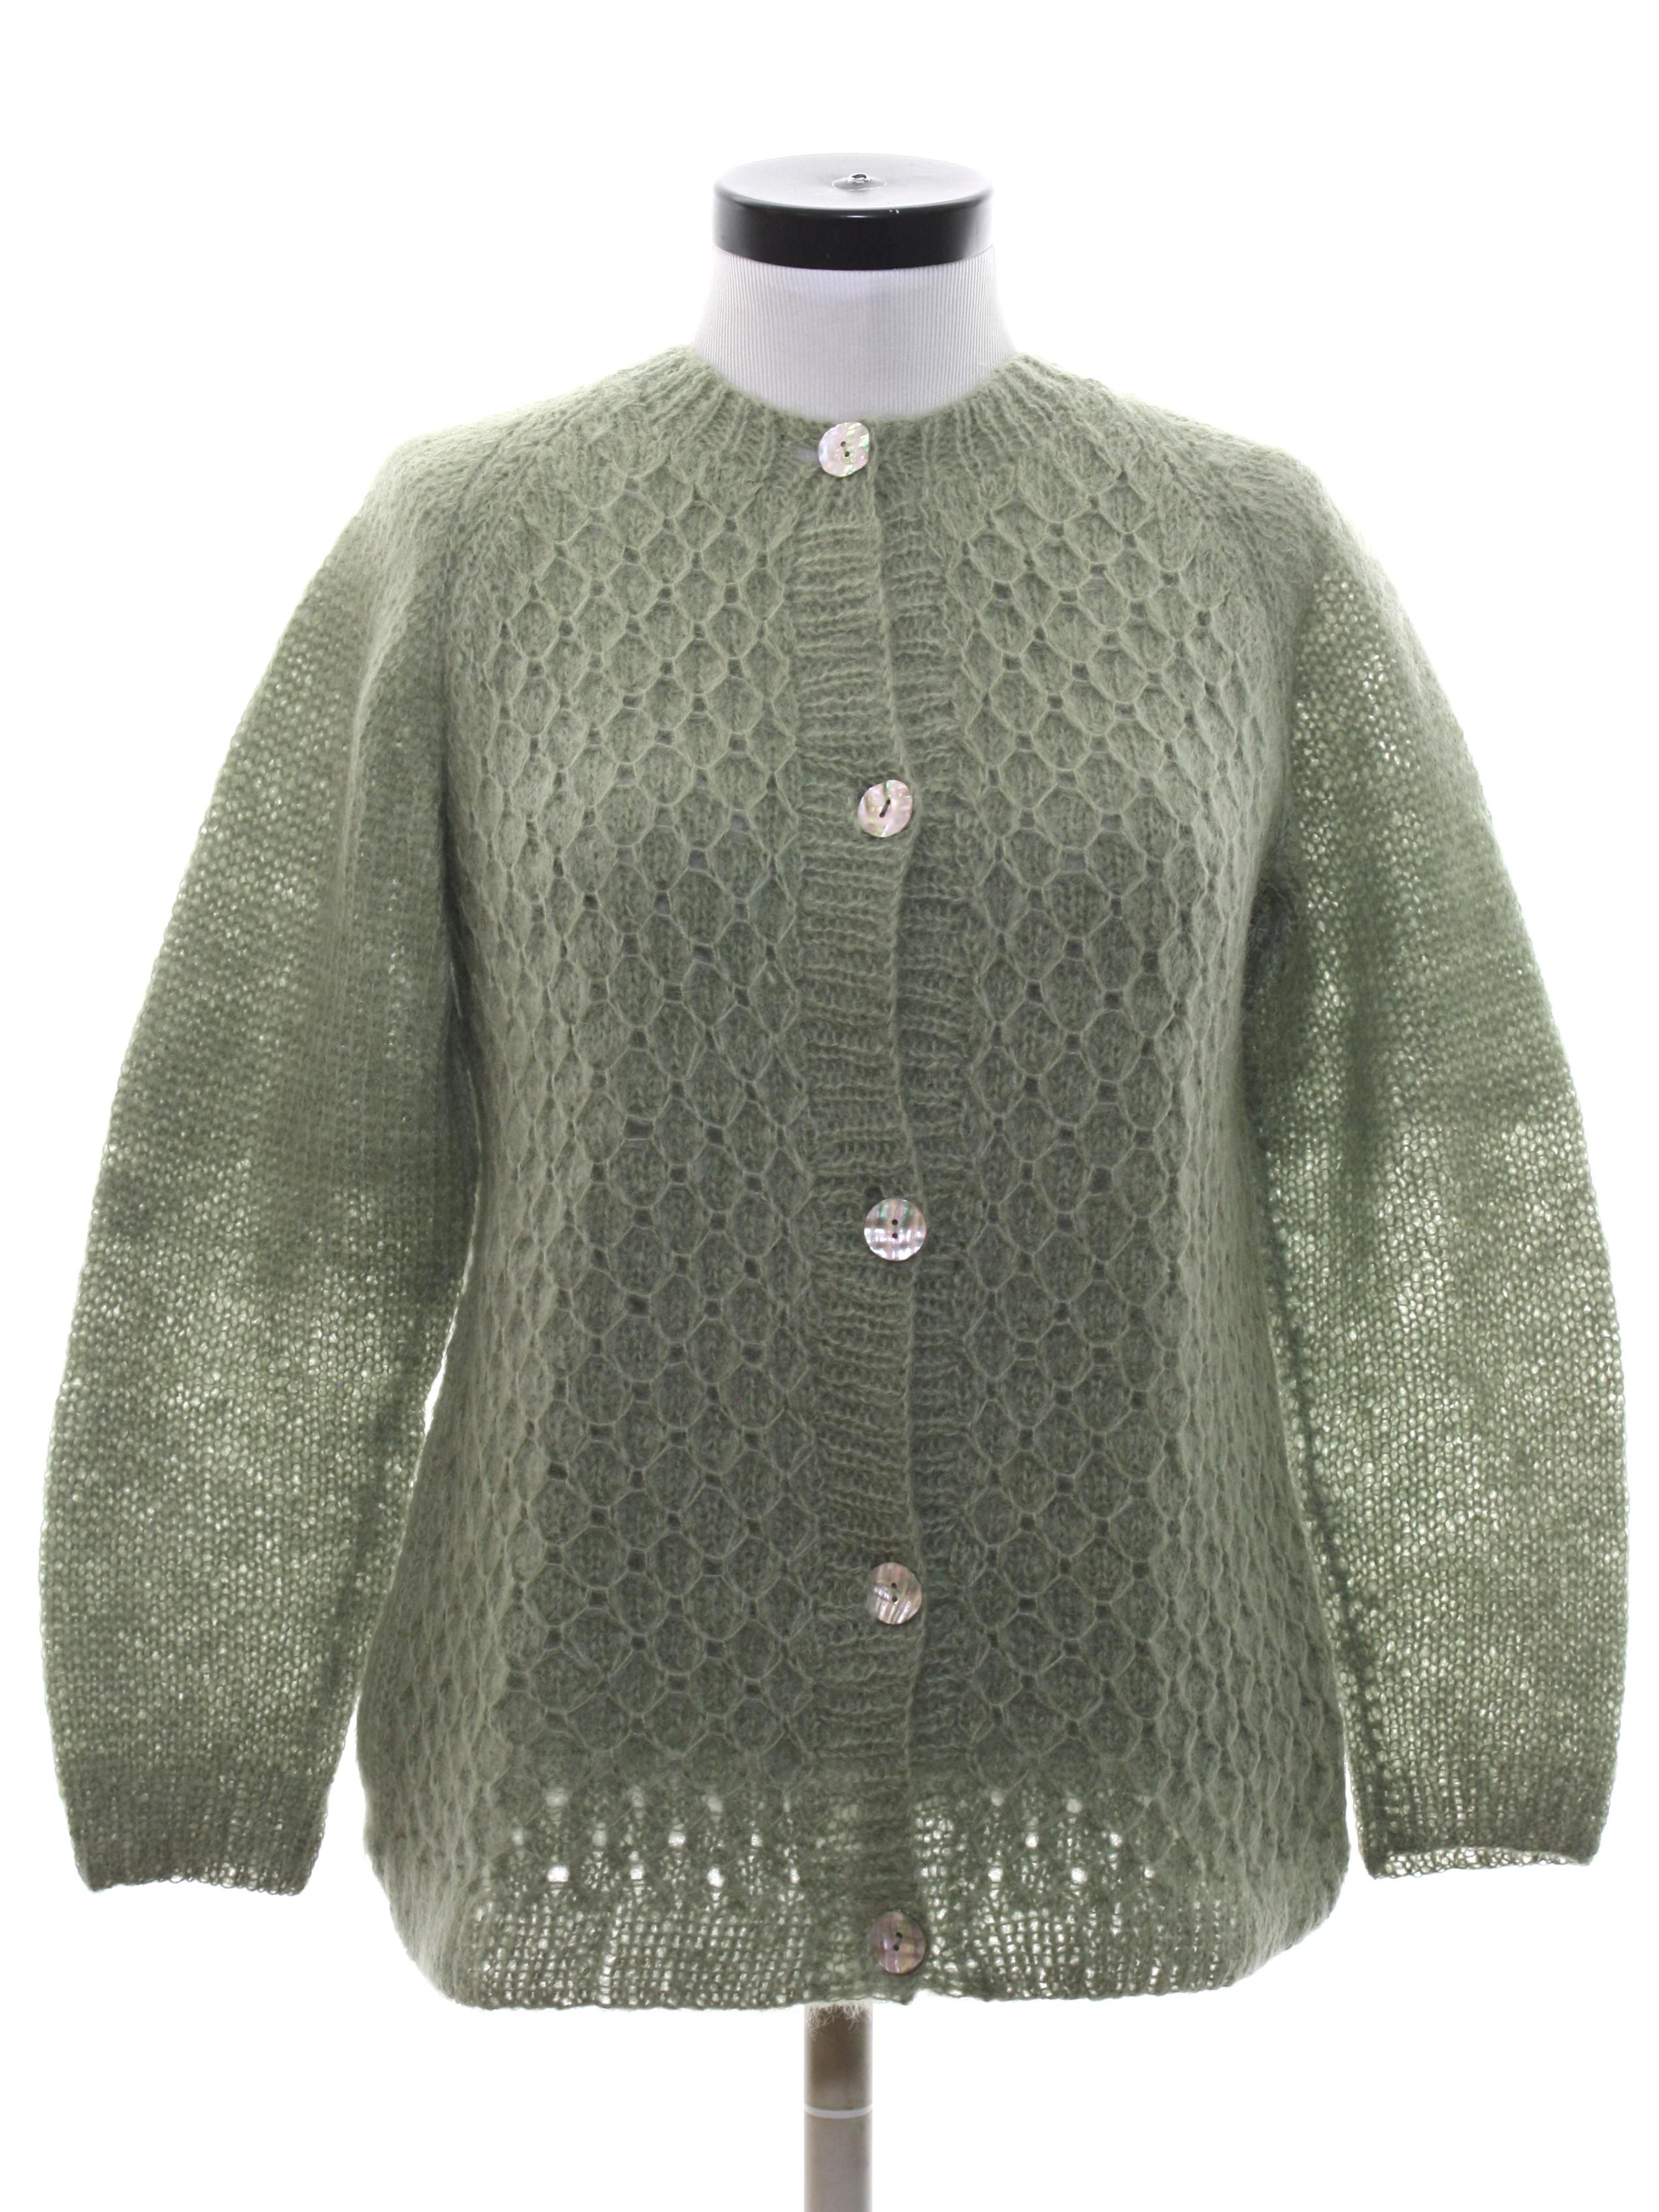 Retro 1960 s Caridgan Sweater (Home Sewn)   60s -Home Sewn- Womens ... ea90882dcf